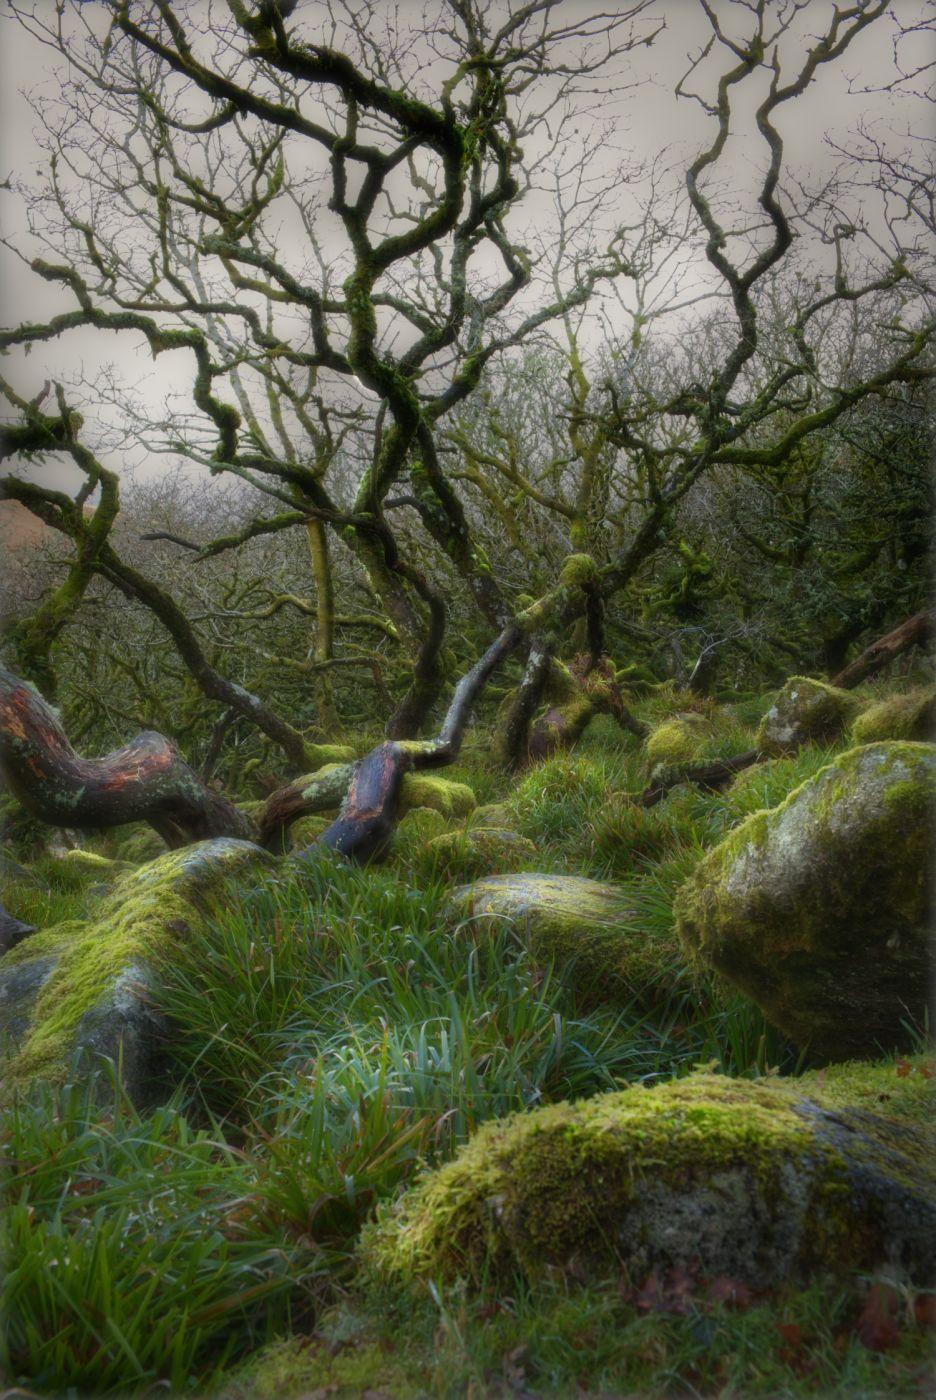 Wistman Woods, United Kingdom